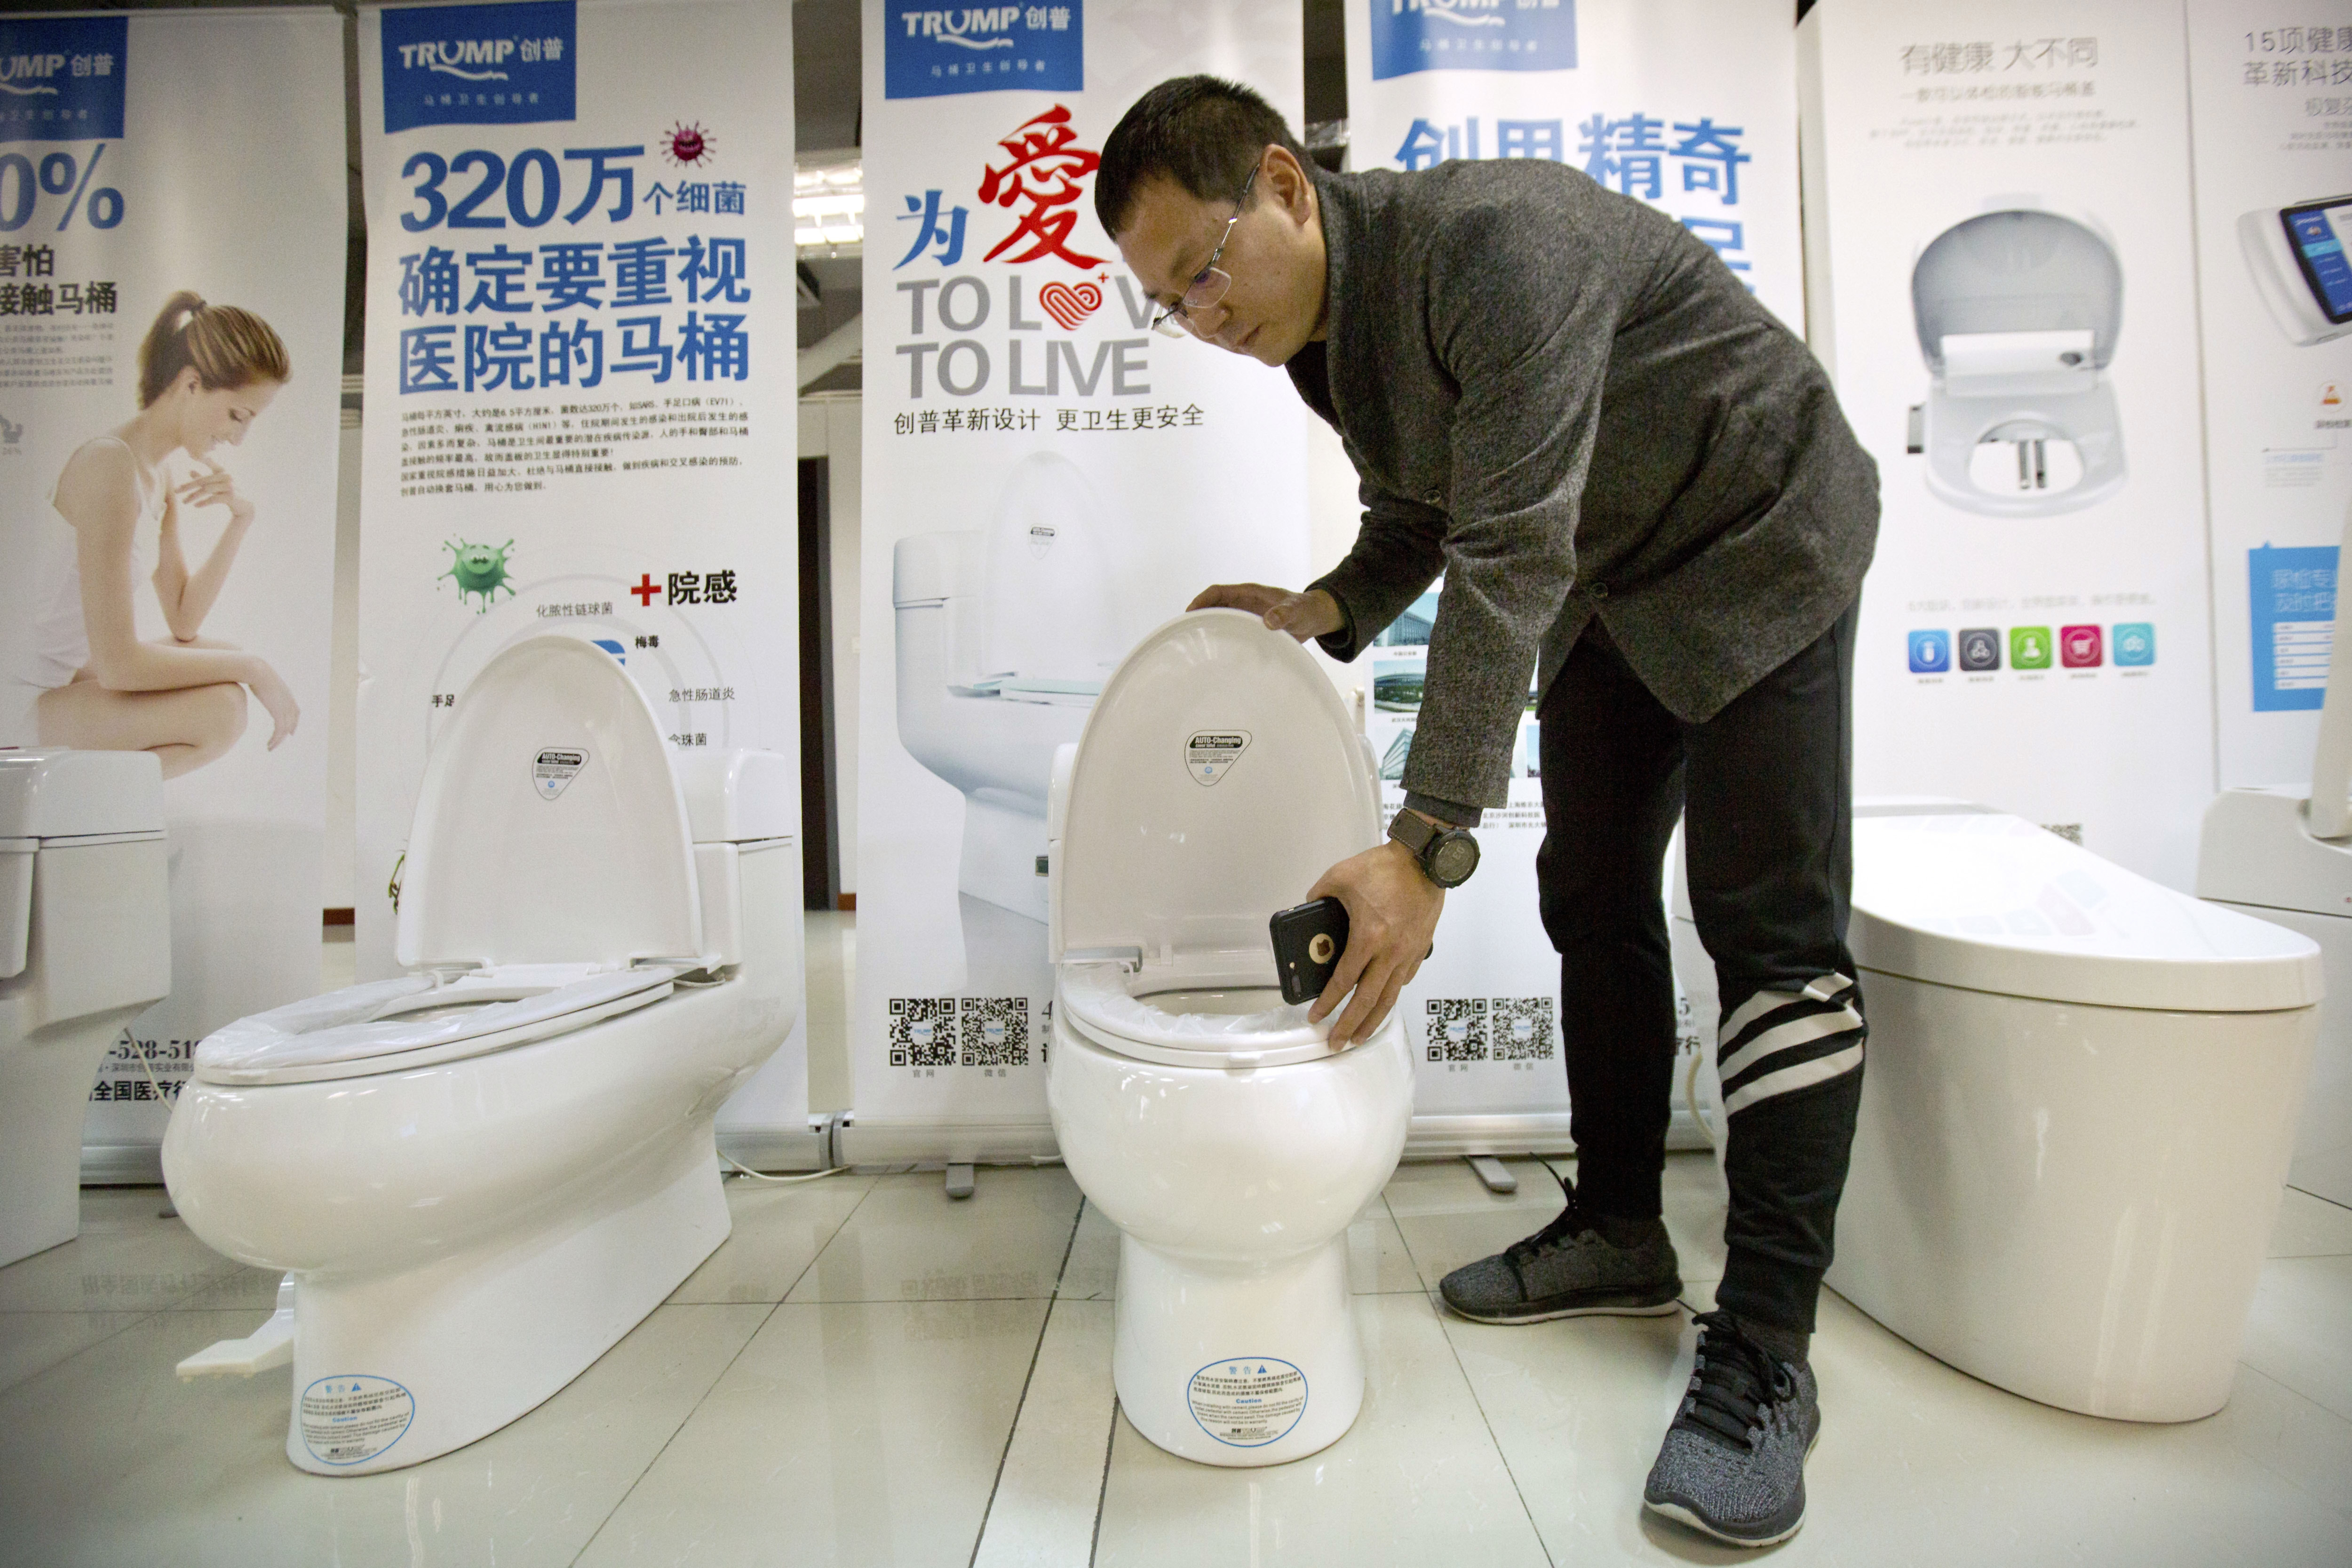 China Trump Trademarks